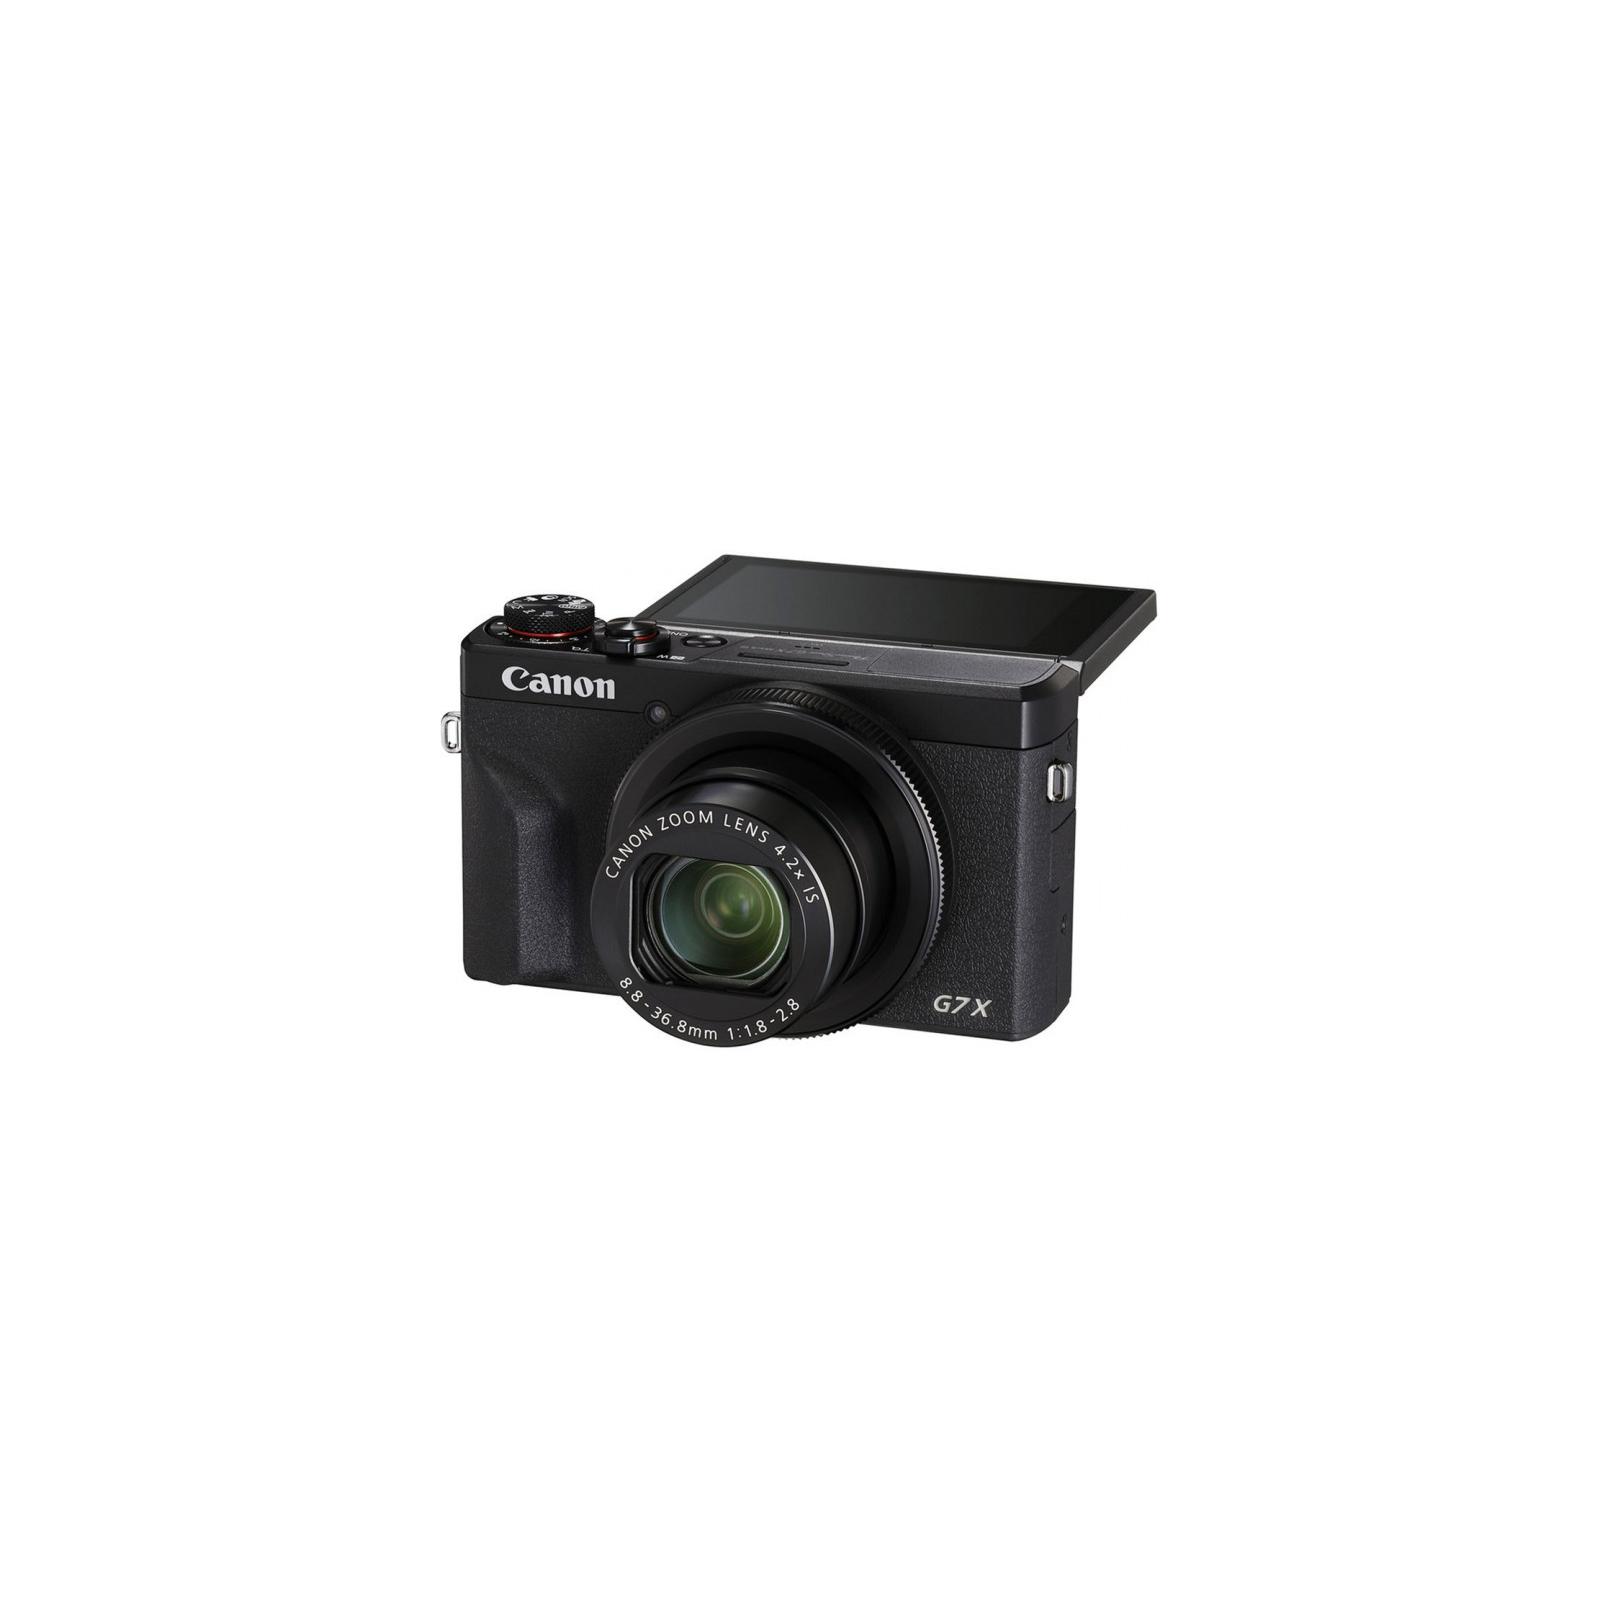 Цифровой фотоаппарат Canon Powershot G7 X Mark III Black (3637C013) изображение 5